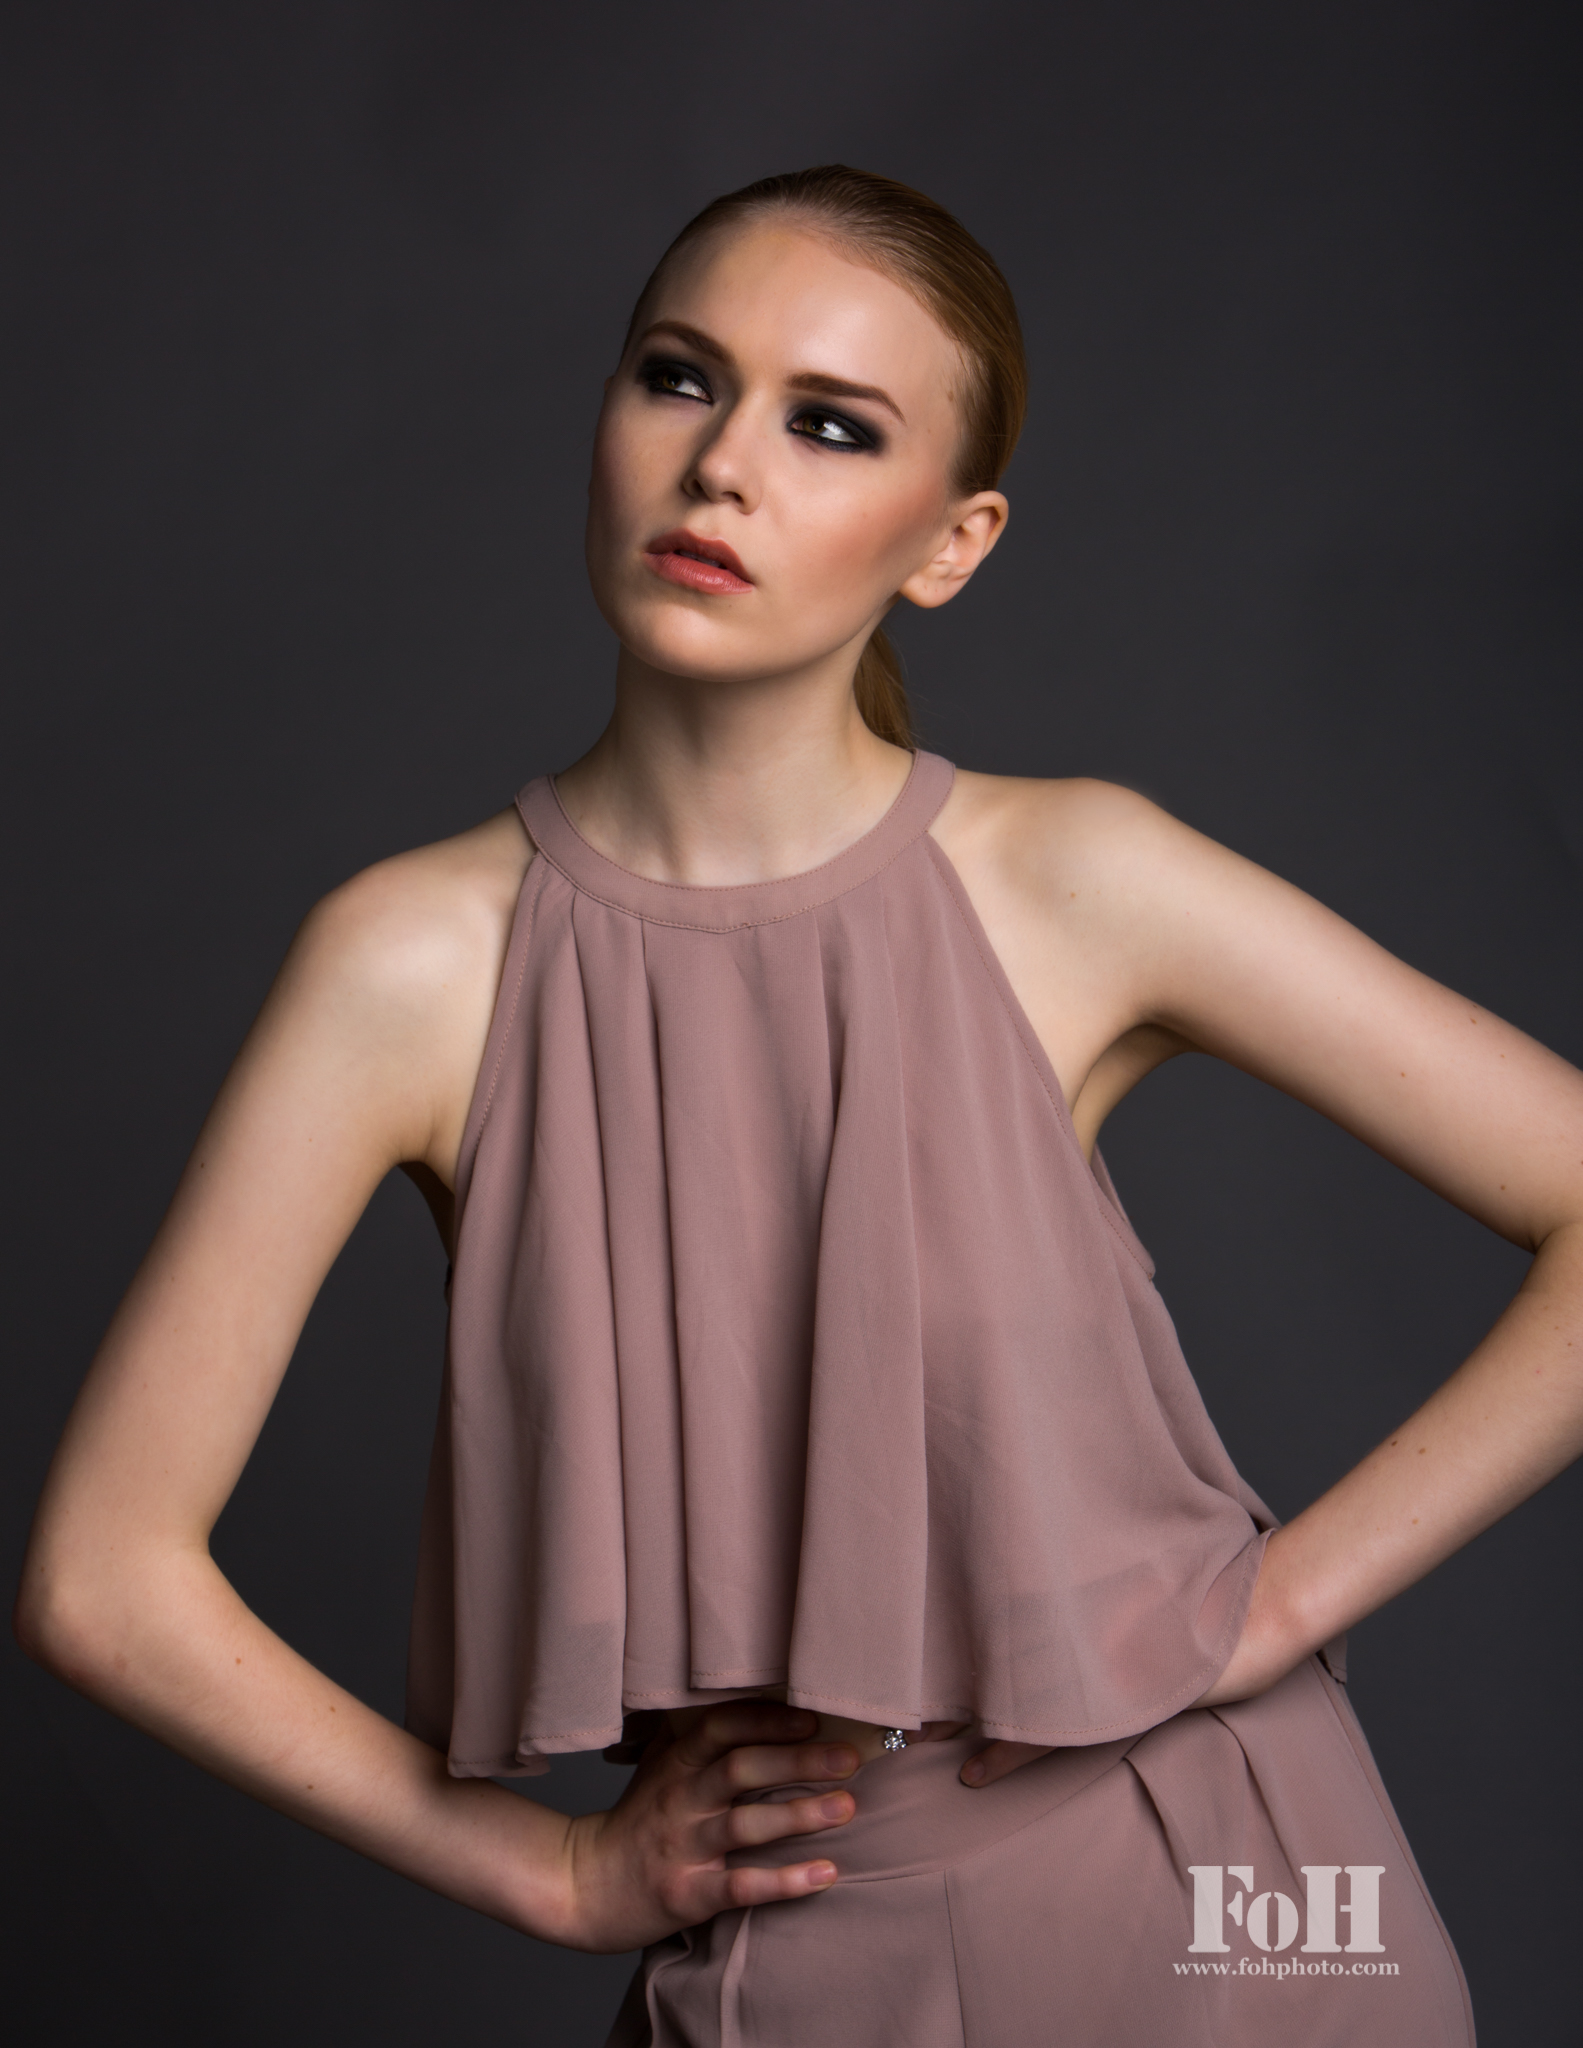 Model: Melanie, Orange Management